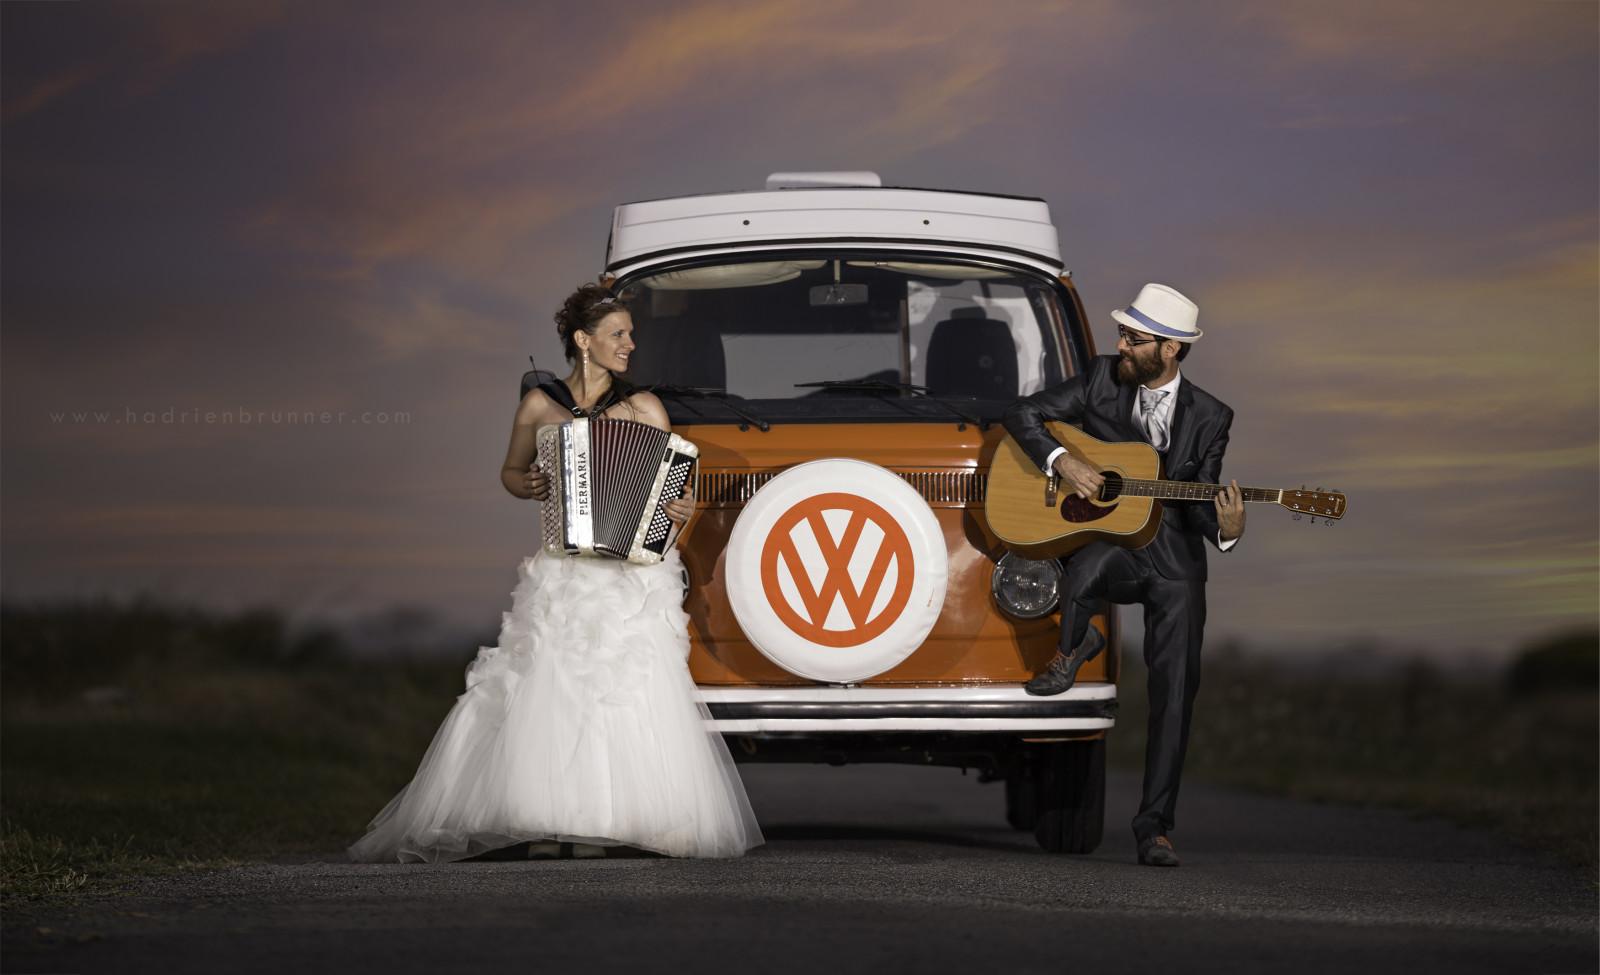 Hintergrundbilder : Porträt, Auto, Fahrzeug, Volkswagen, Kanon ...